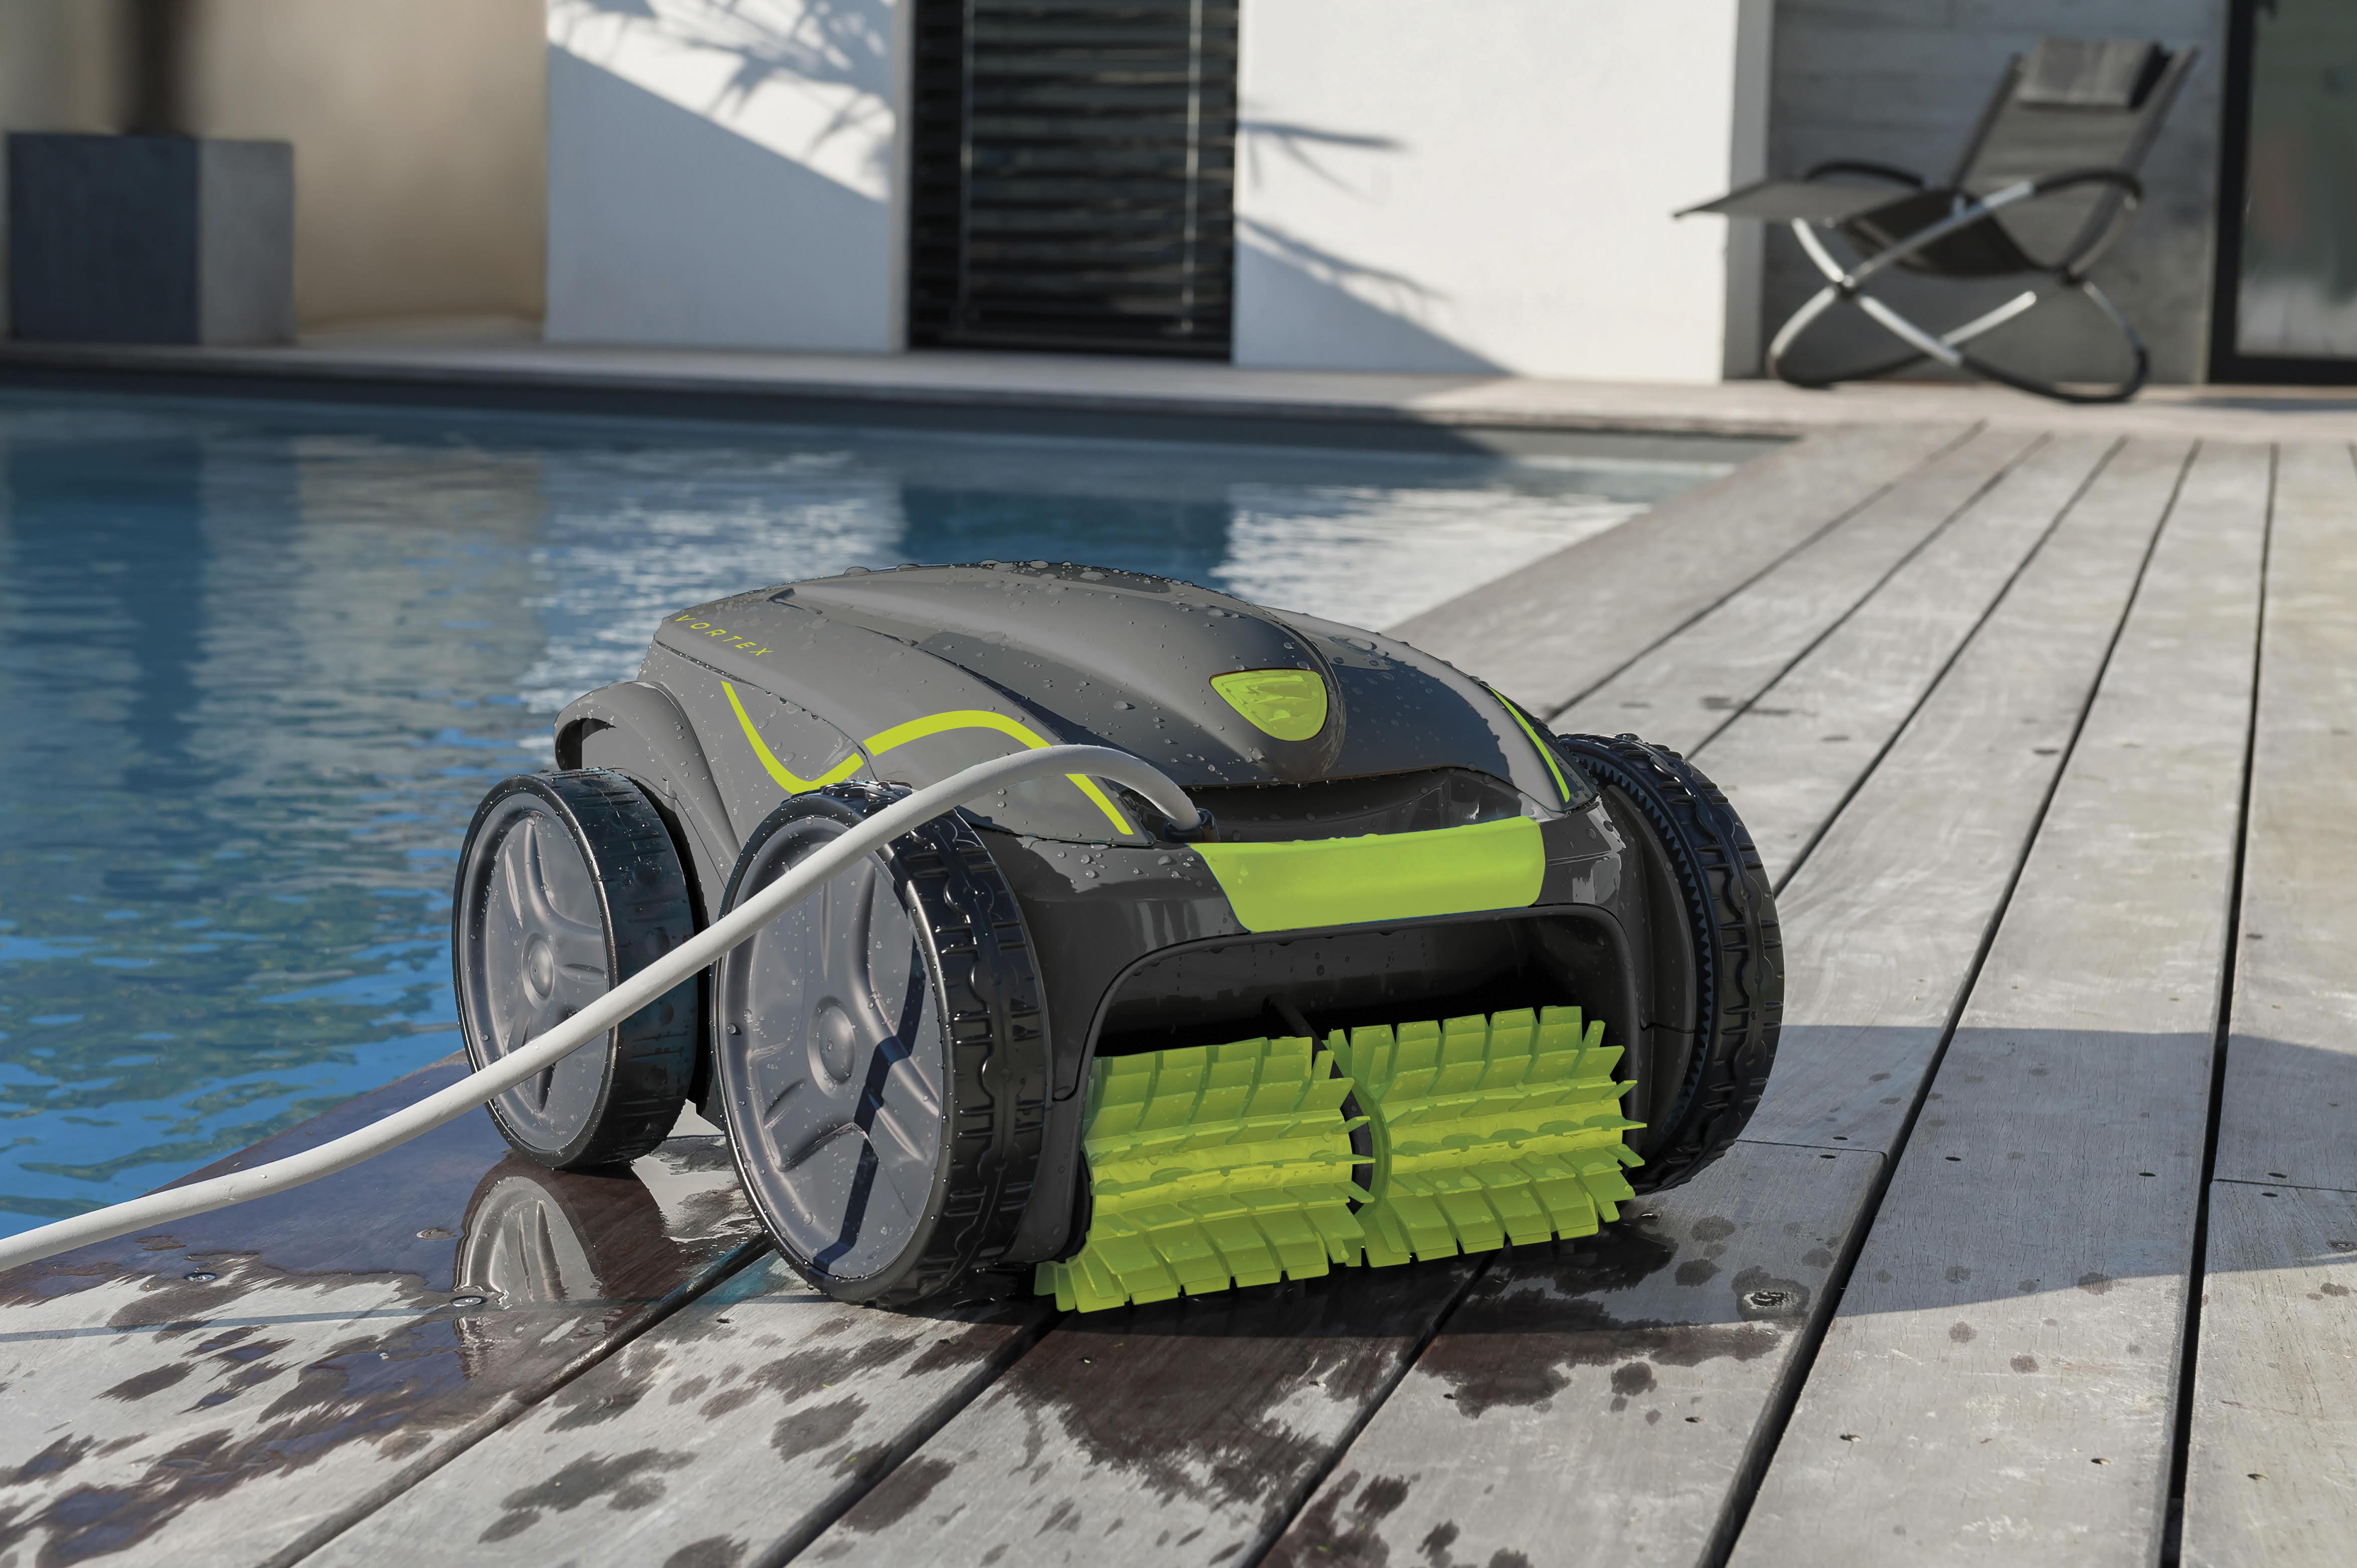 Limpiafondos para piscina desmontable